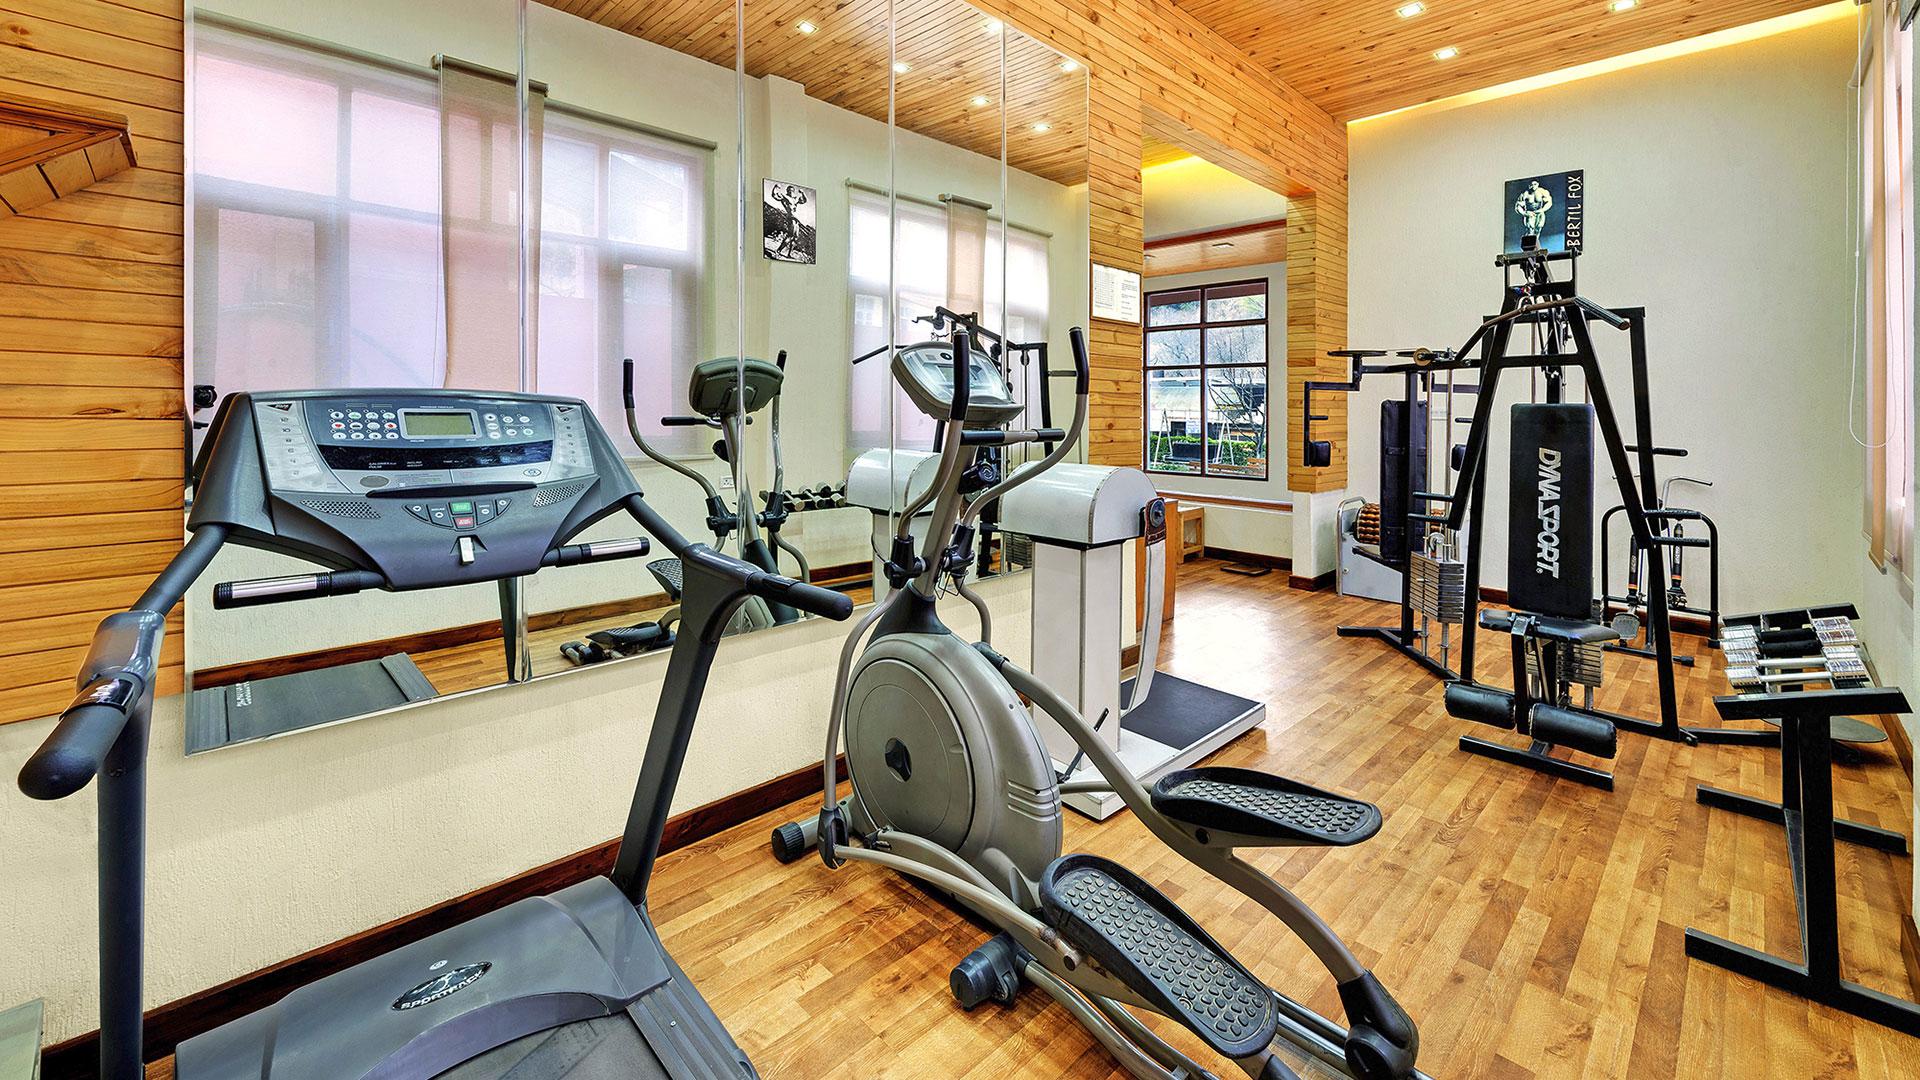 Gym in Hotel - Verdure Wellness